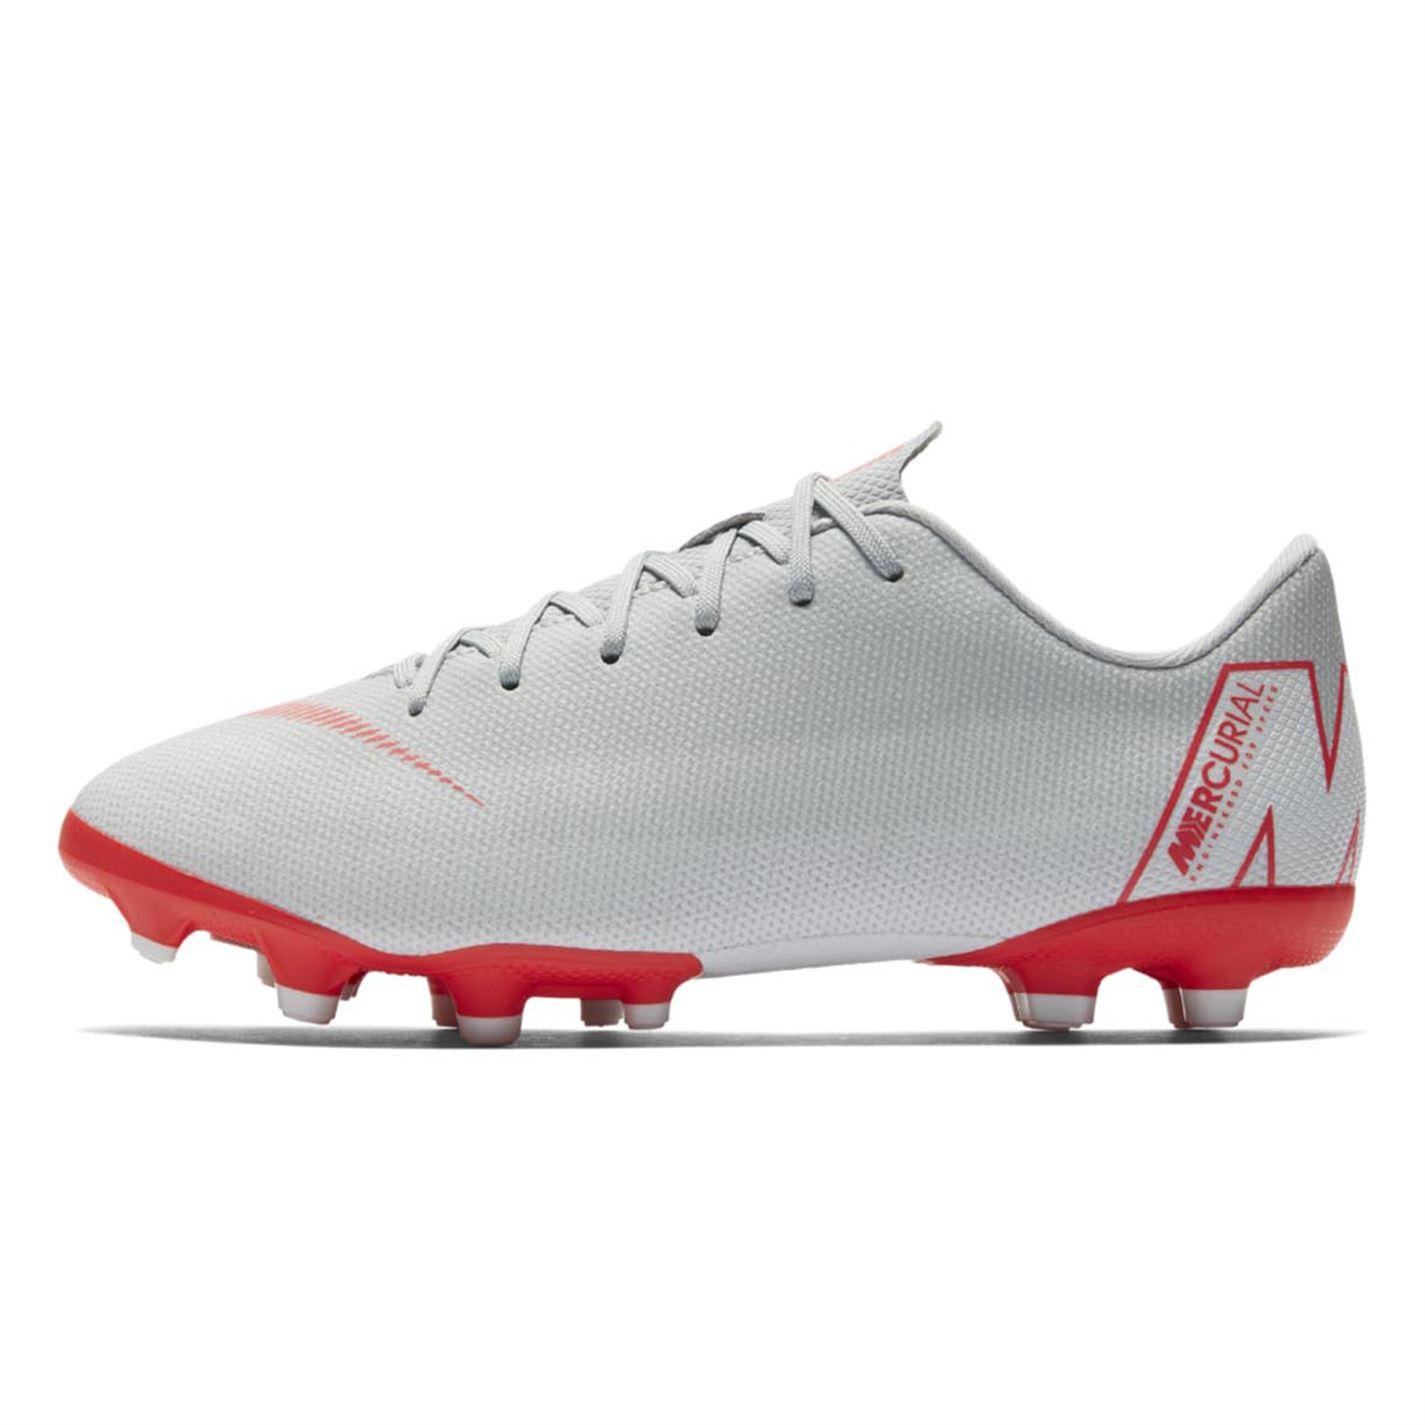 Nike Mercurial Vapor Academy Unisex Junior FG Football Boots